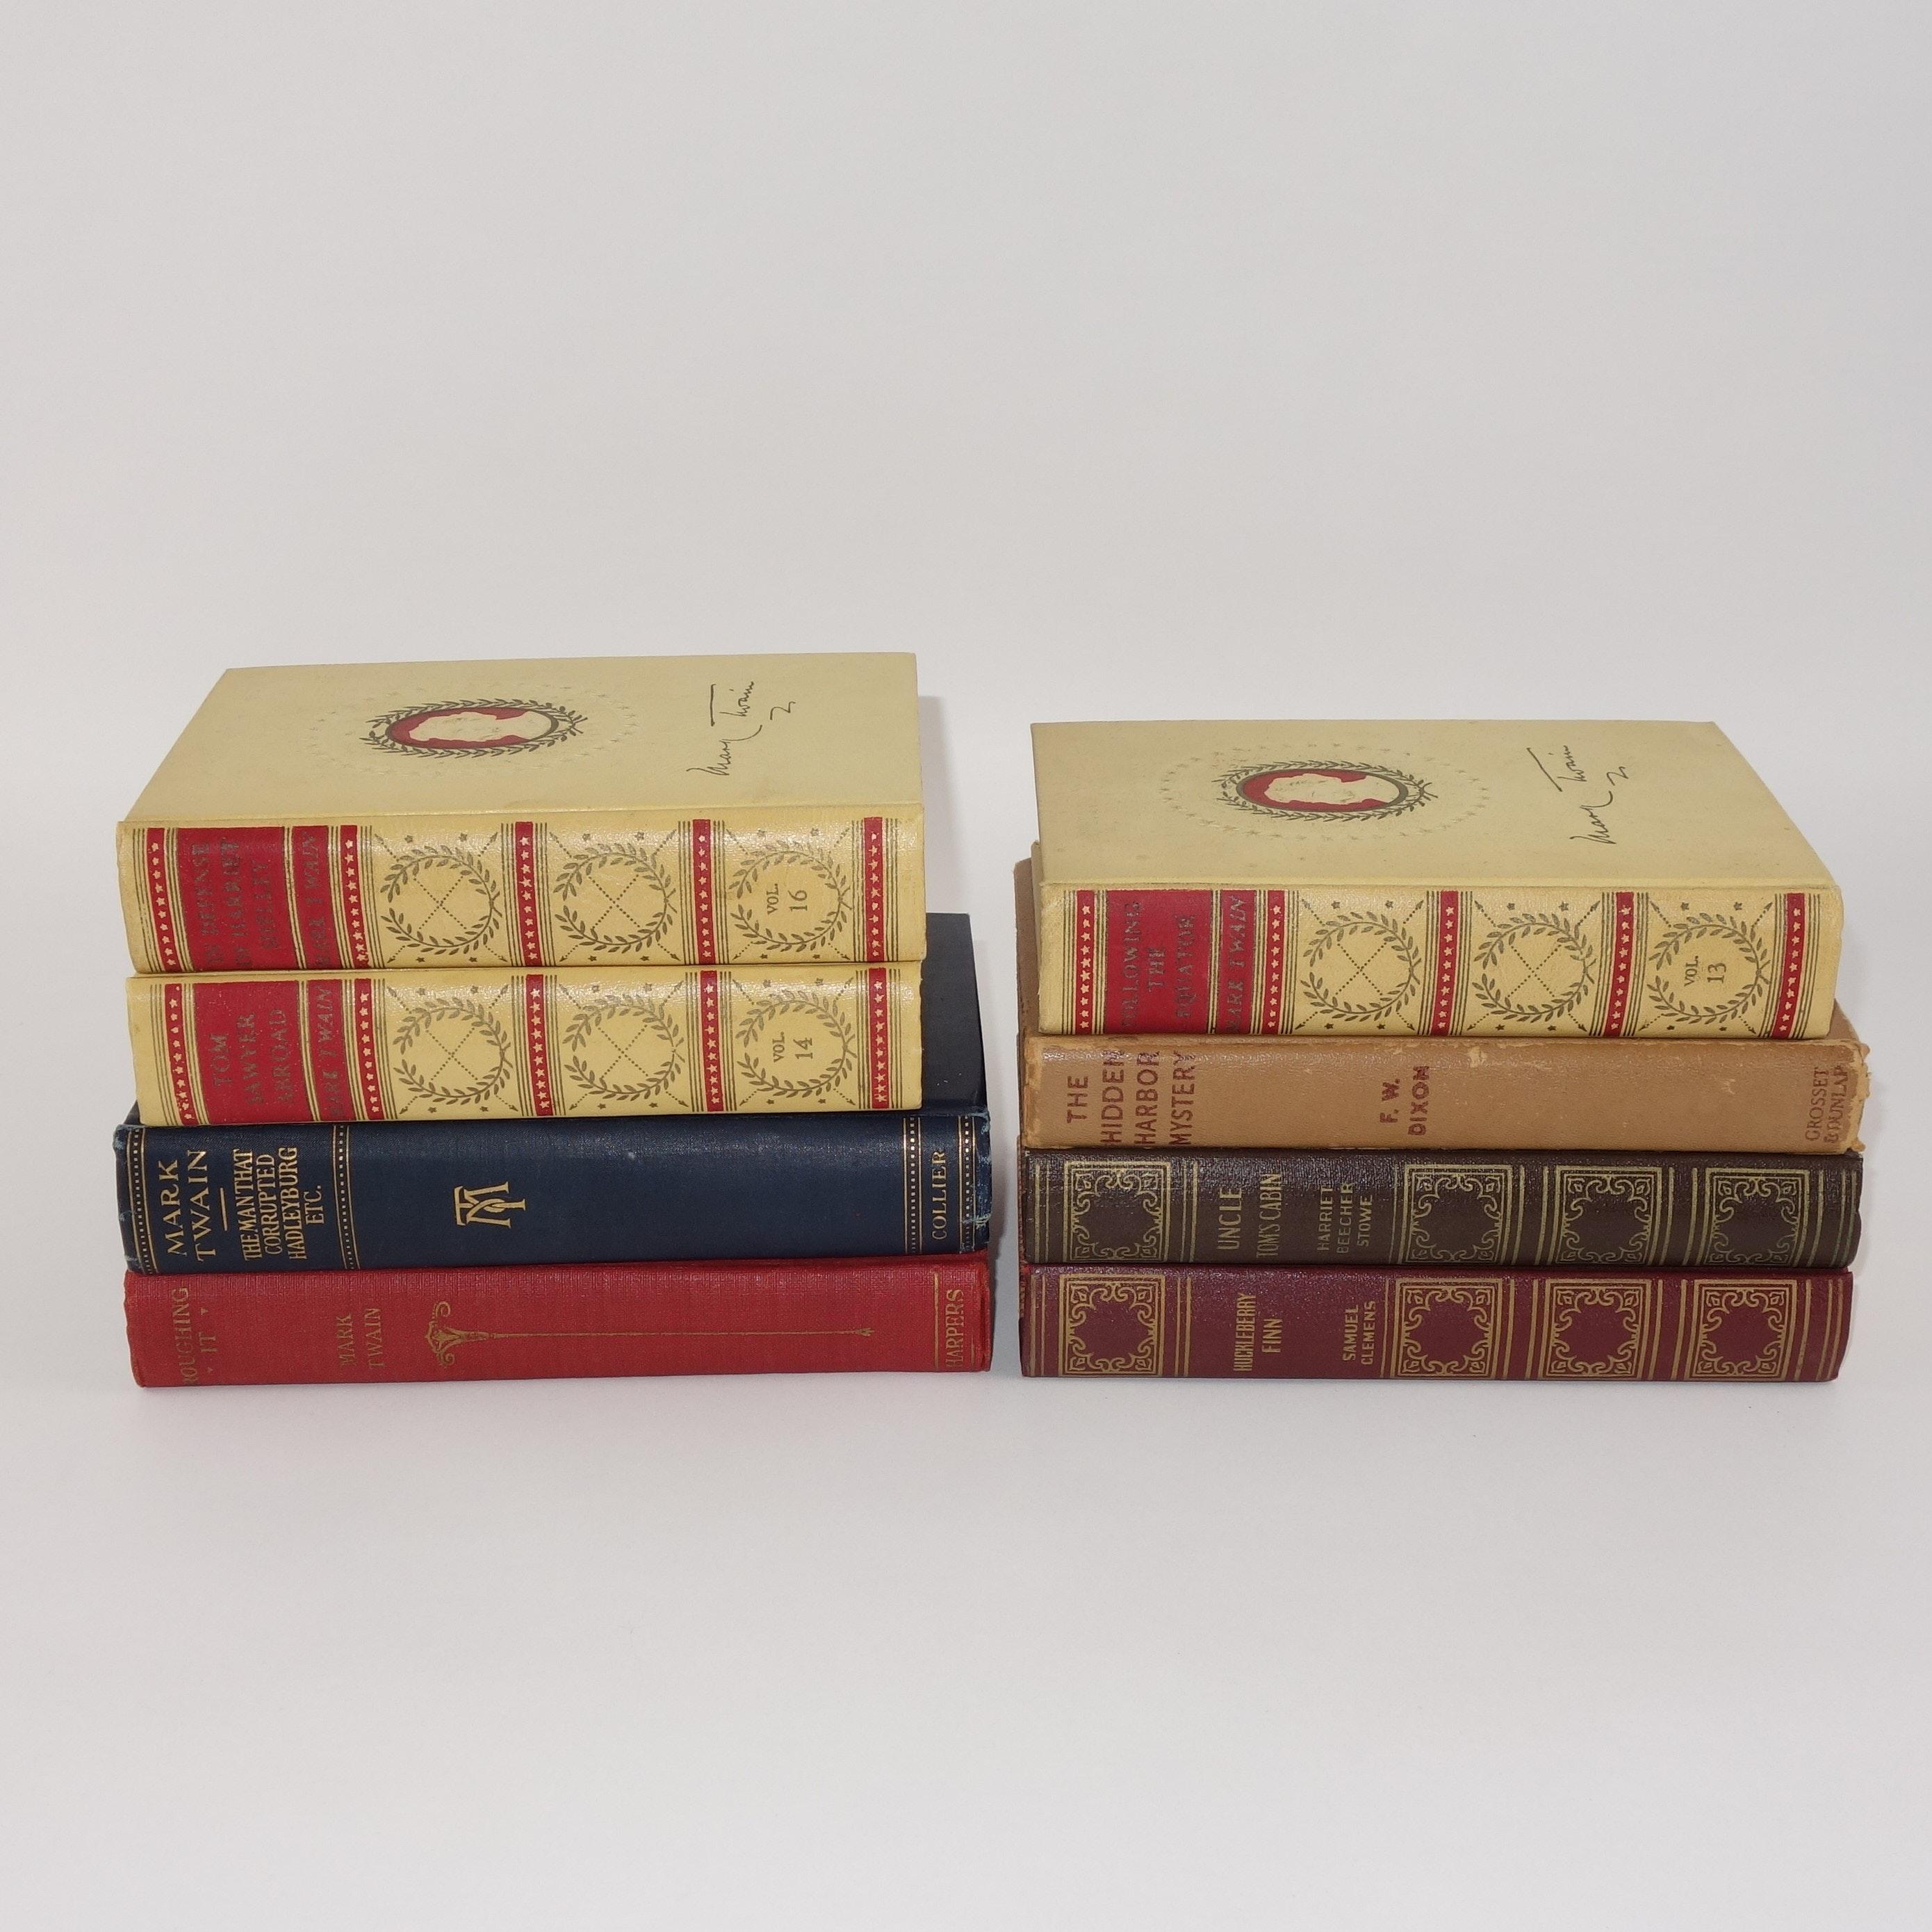 Mark Twain Books and More